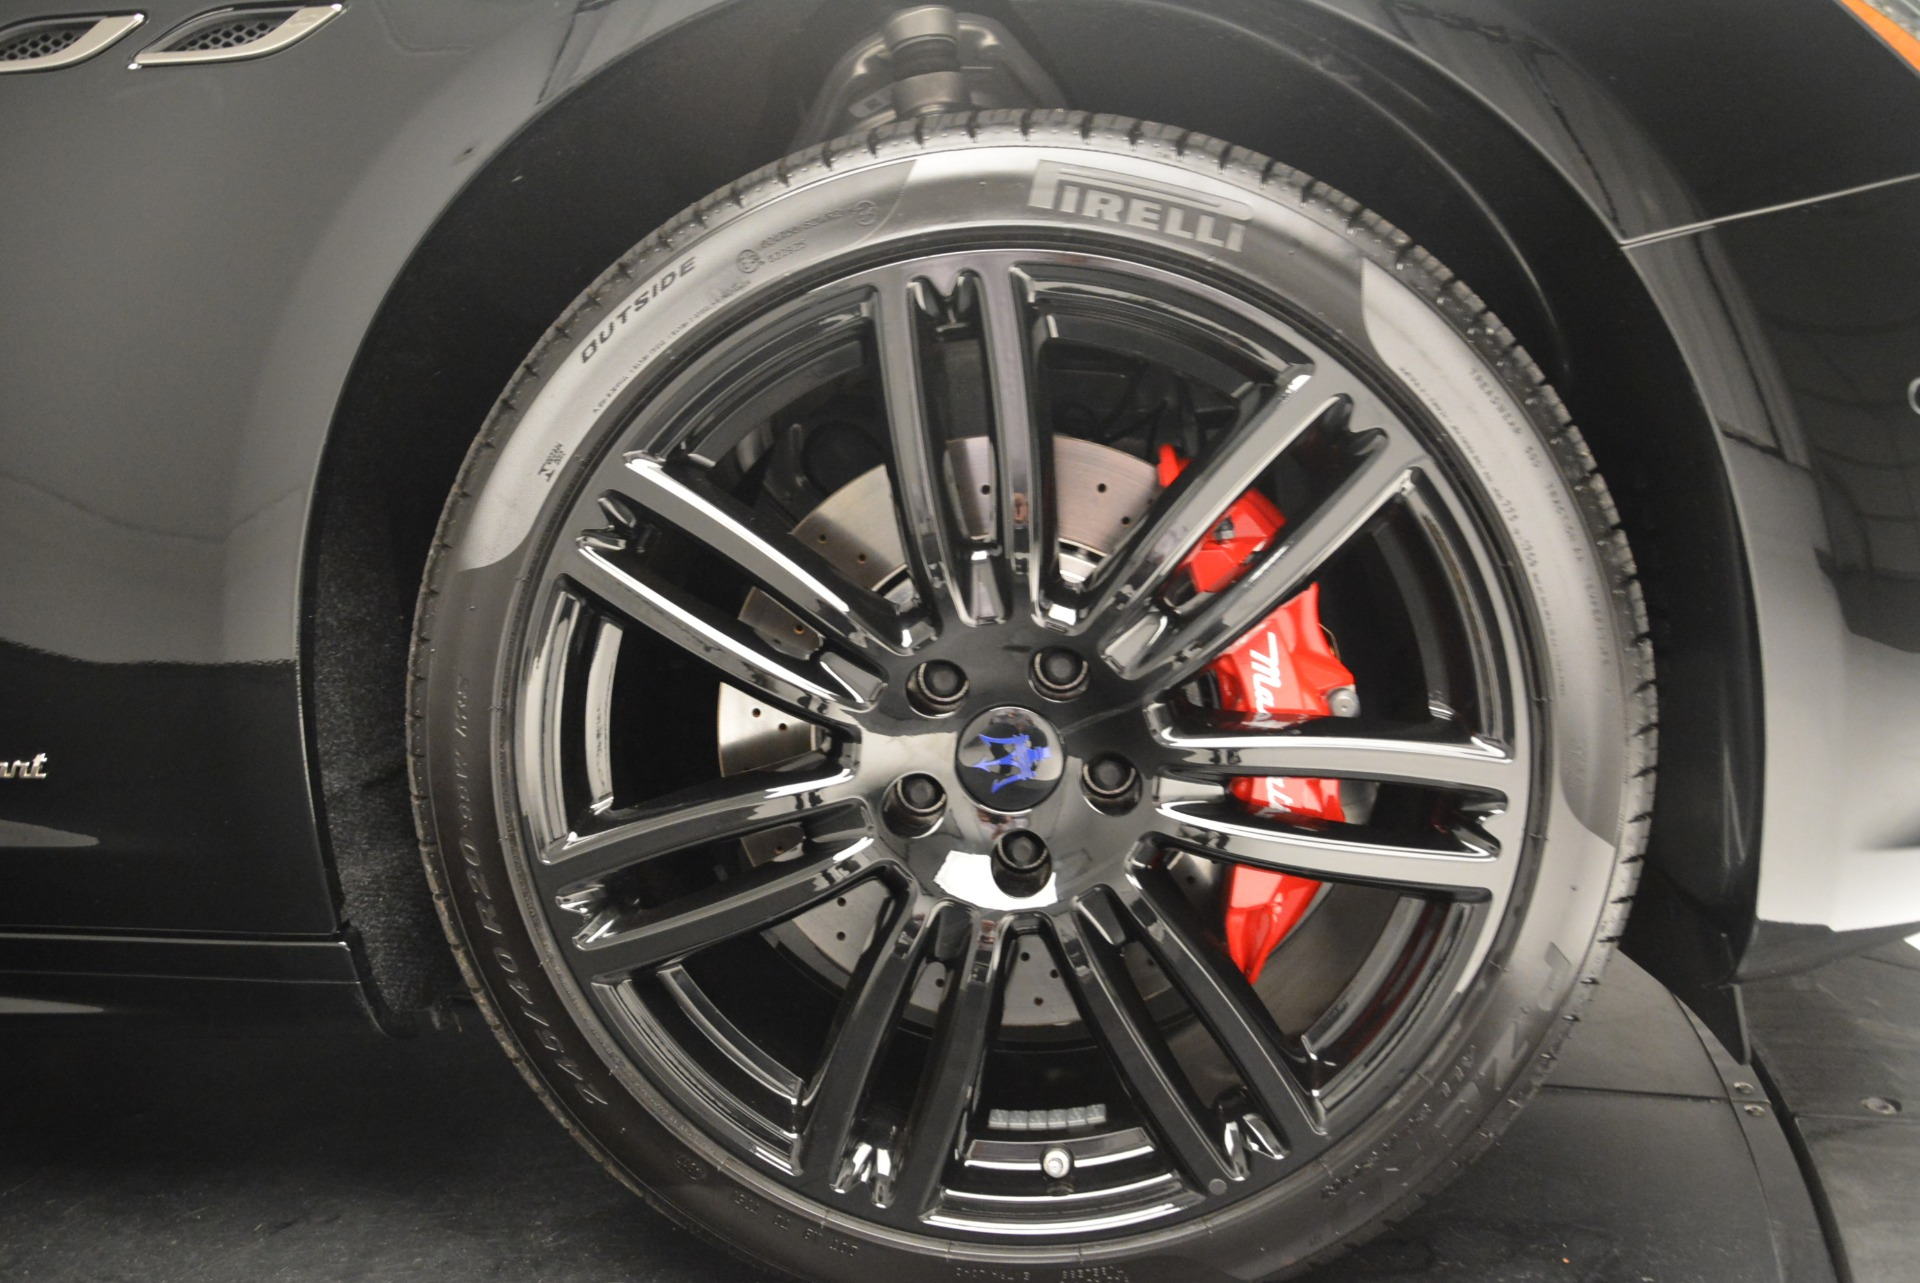 New 2018 Maserati Ghibli SQ4 GranSport Nerissimo For Sale In Westport, CT 2366_p25